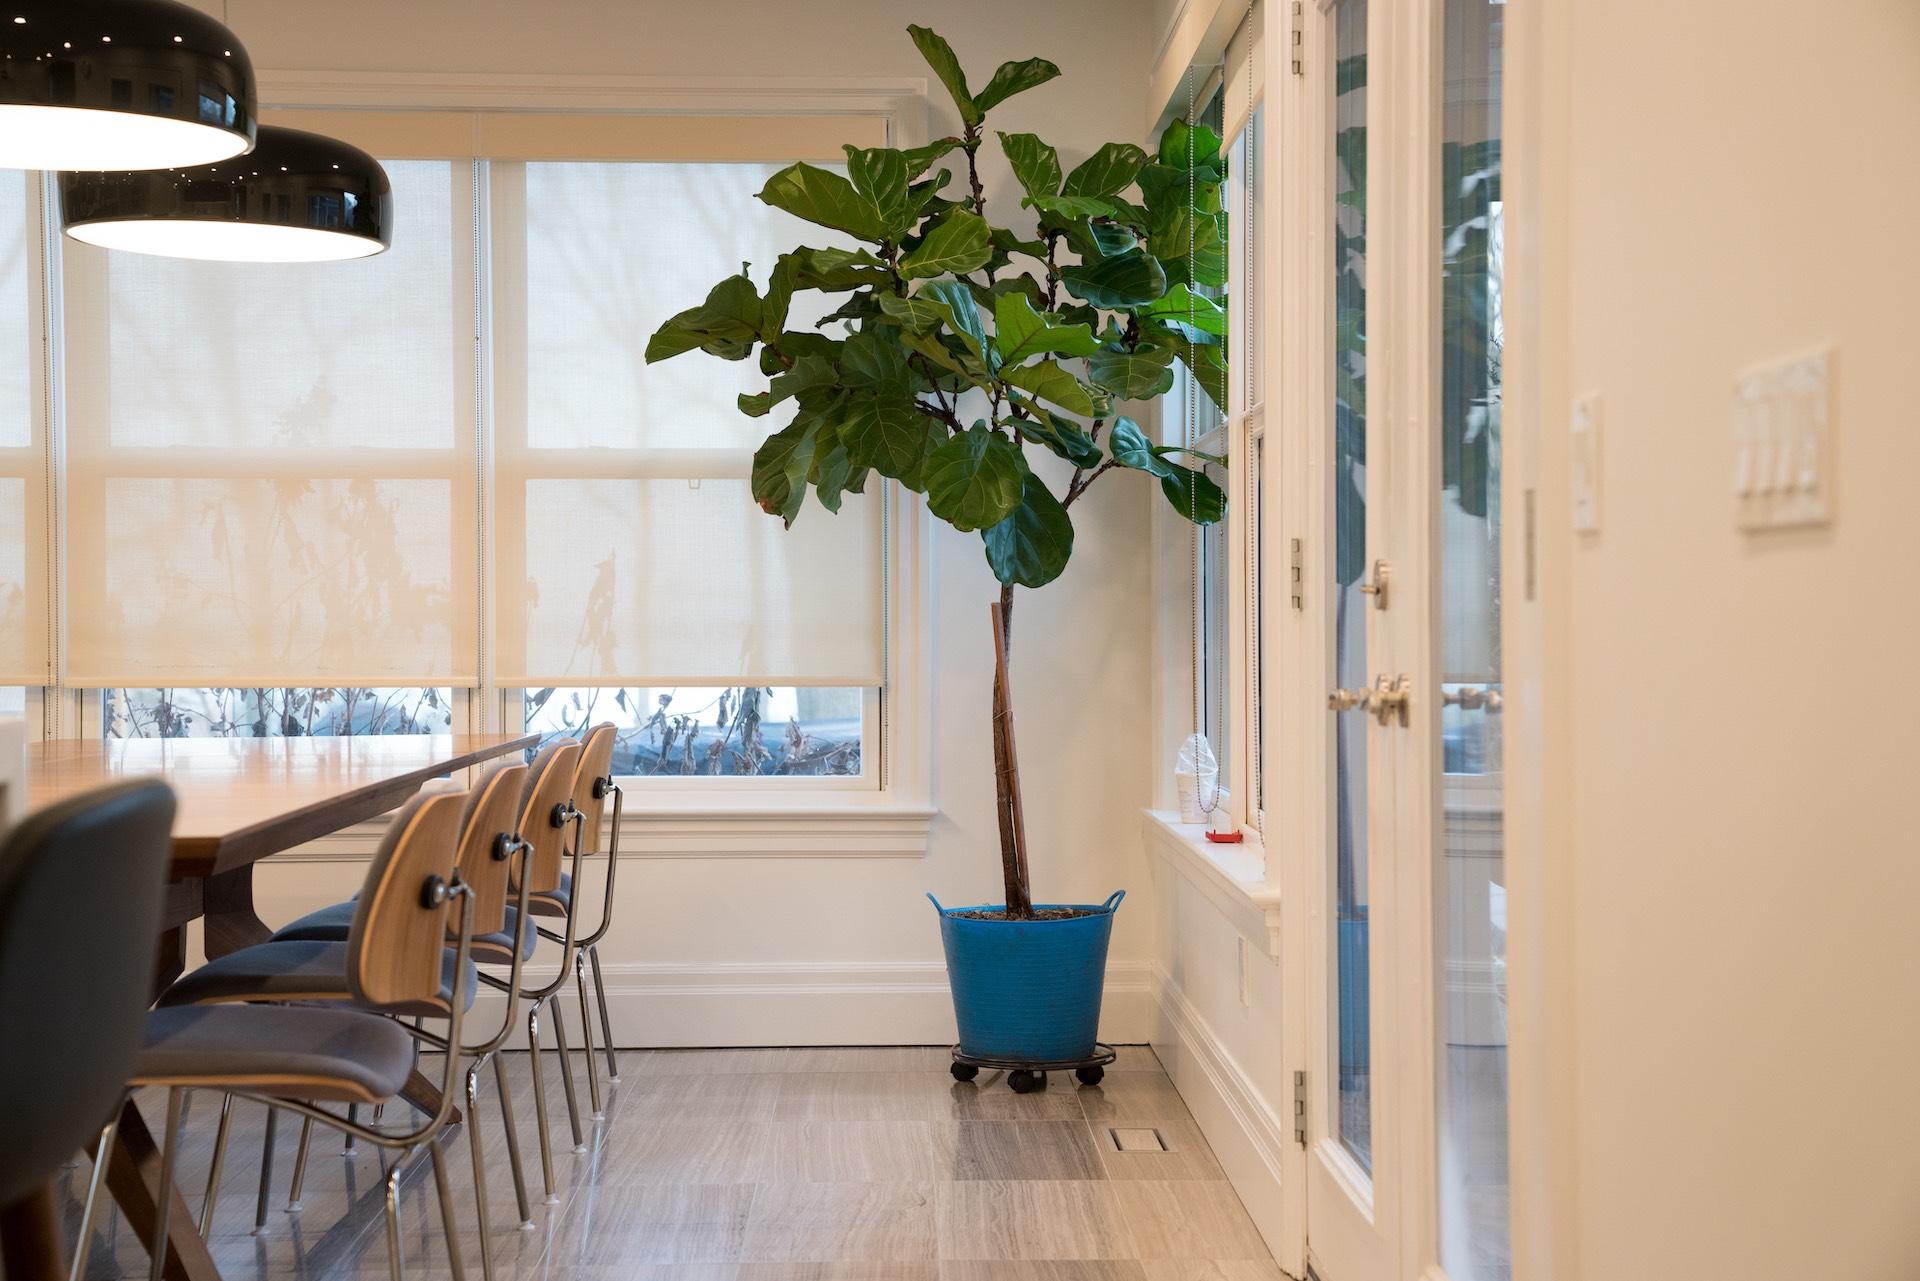 Plant in corner of kitchen